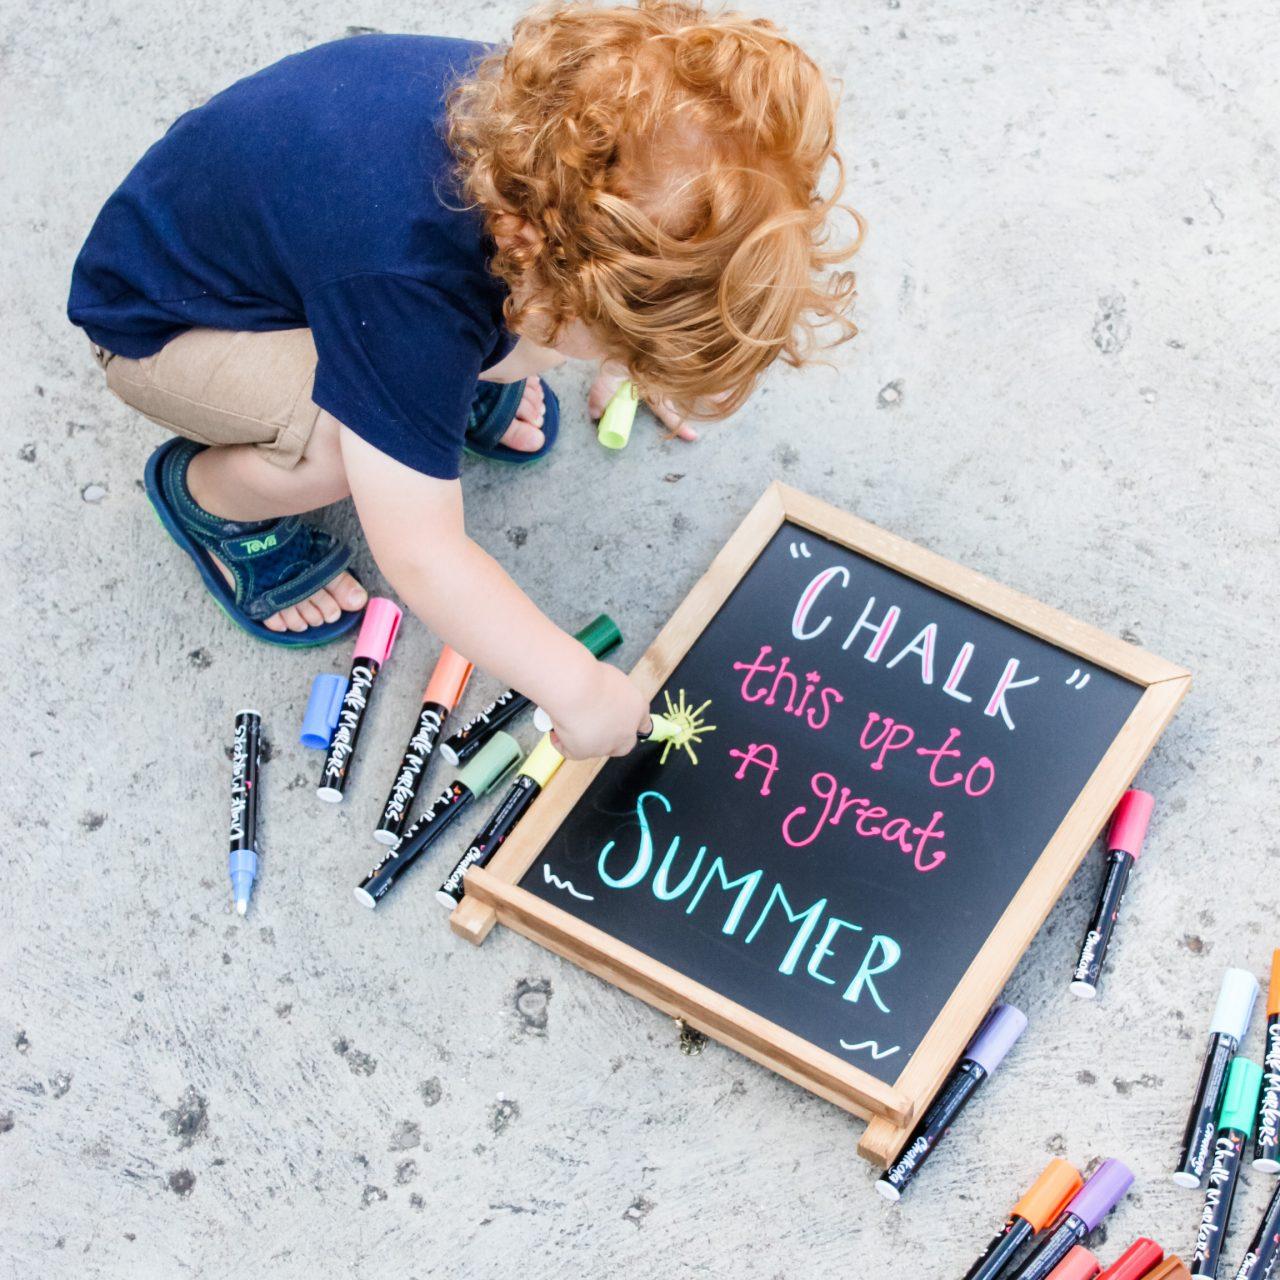 KID FRIENDLY, SUMMER FUN WITH CHALKOLA